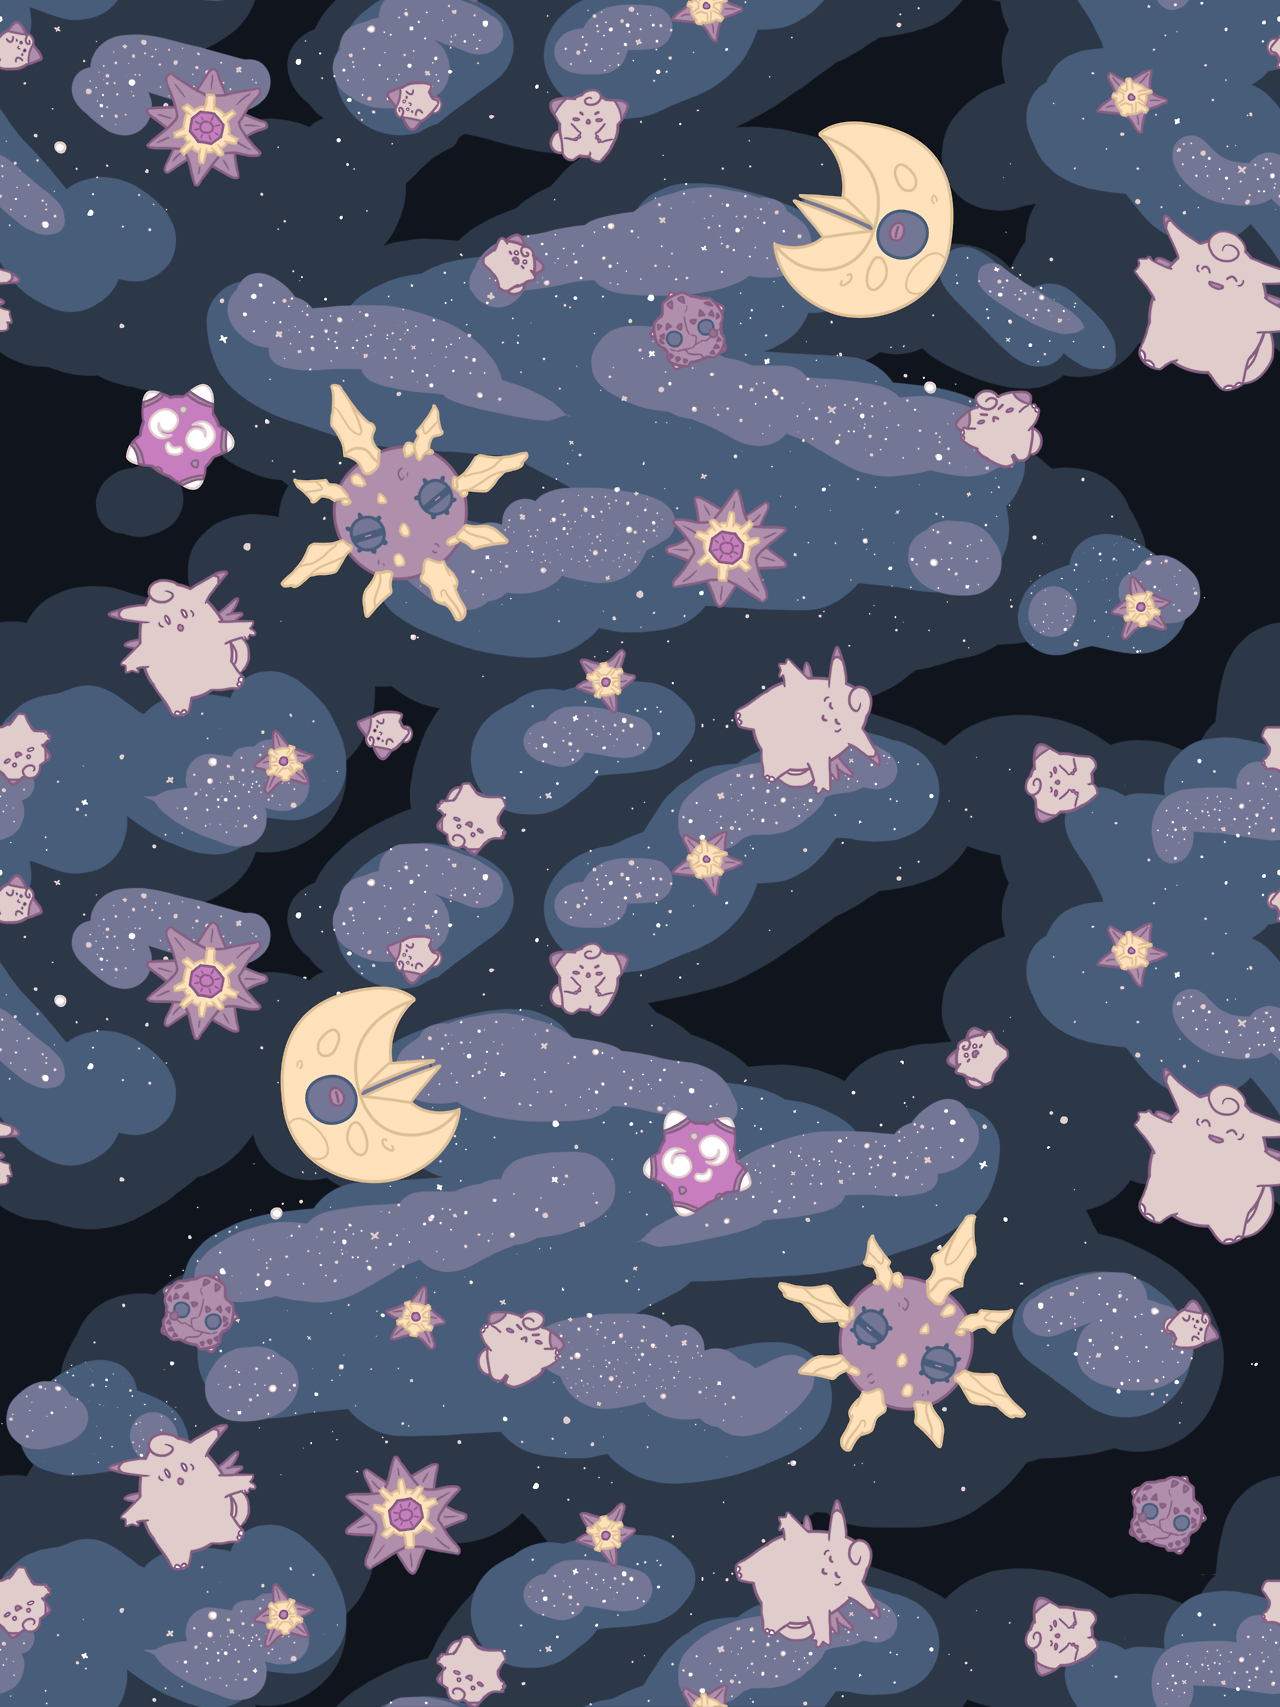 Pin by Scarlet Nossna on Pokmon Pokemon Pokemon fabric 1280x1707